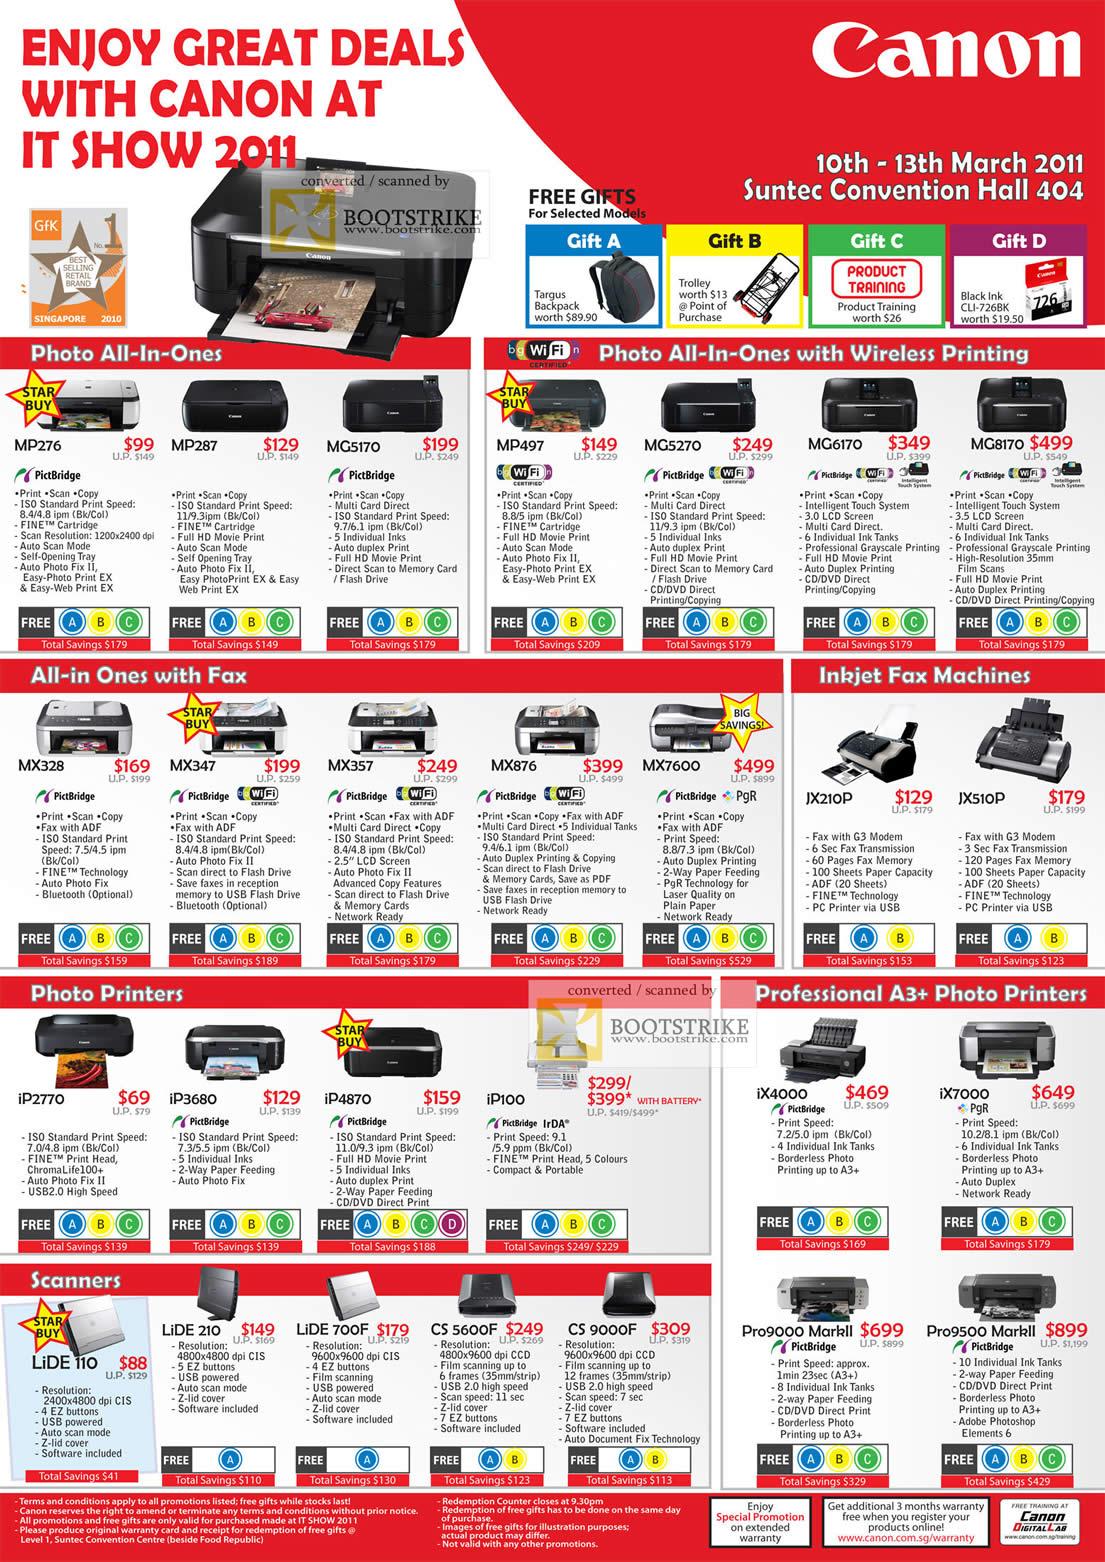 IT Show 2011 price list image brochure of Canon Laser Printers Lasershot LBP6000 LBP3500 MF4412 D520 MF4450 MF4580DN MF5870DN LBP5050N LBP7200CD MF8350CN LBP7750DN LV7280